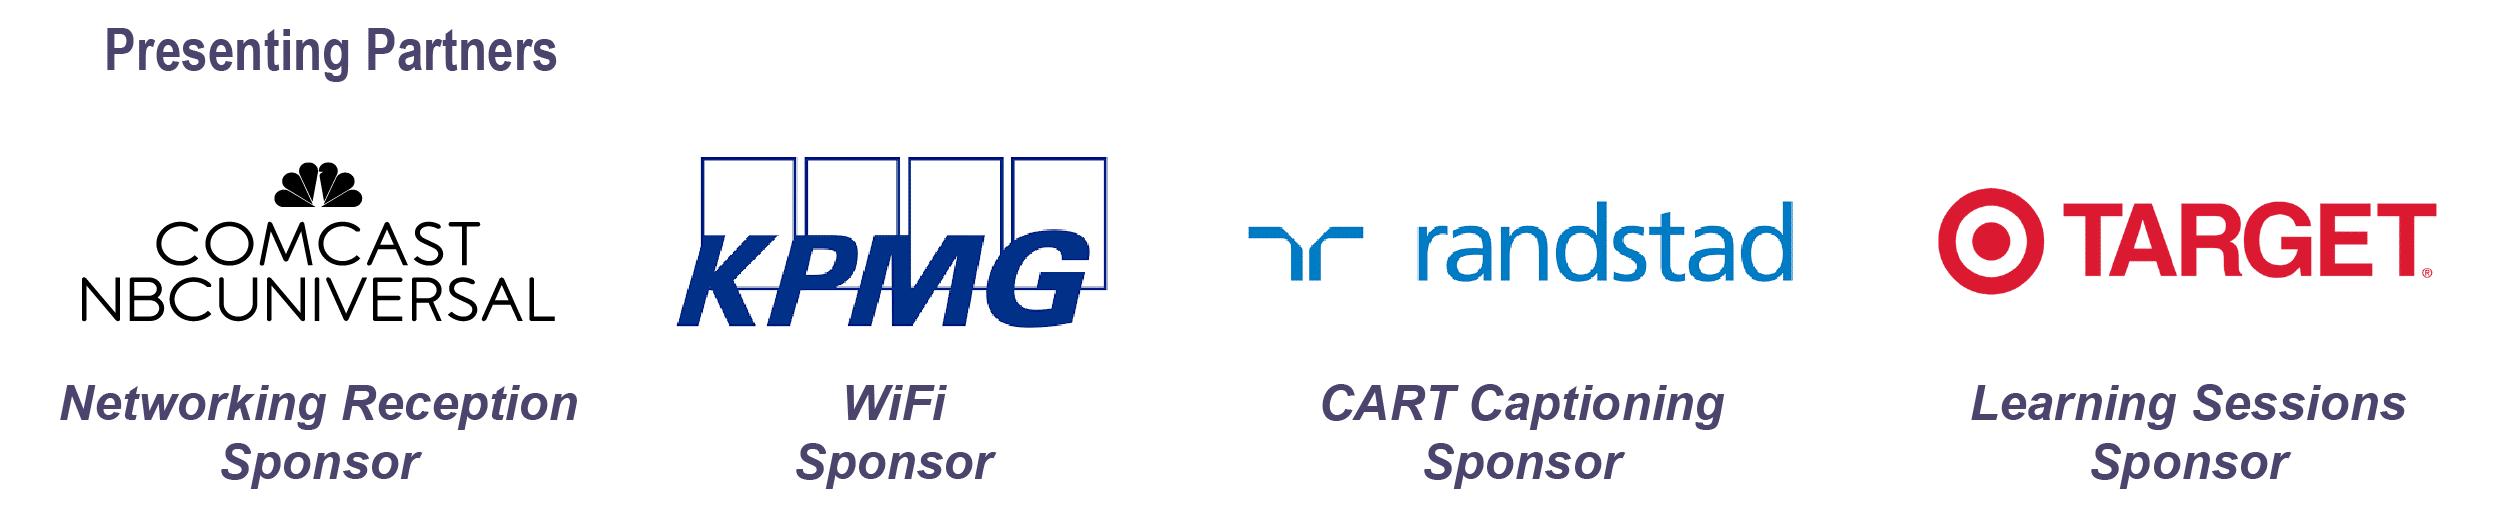 Comcast NBC Universal; KPMG; Randstad; Target